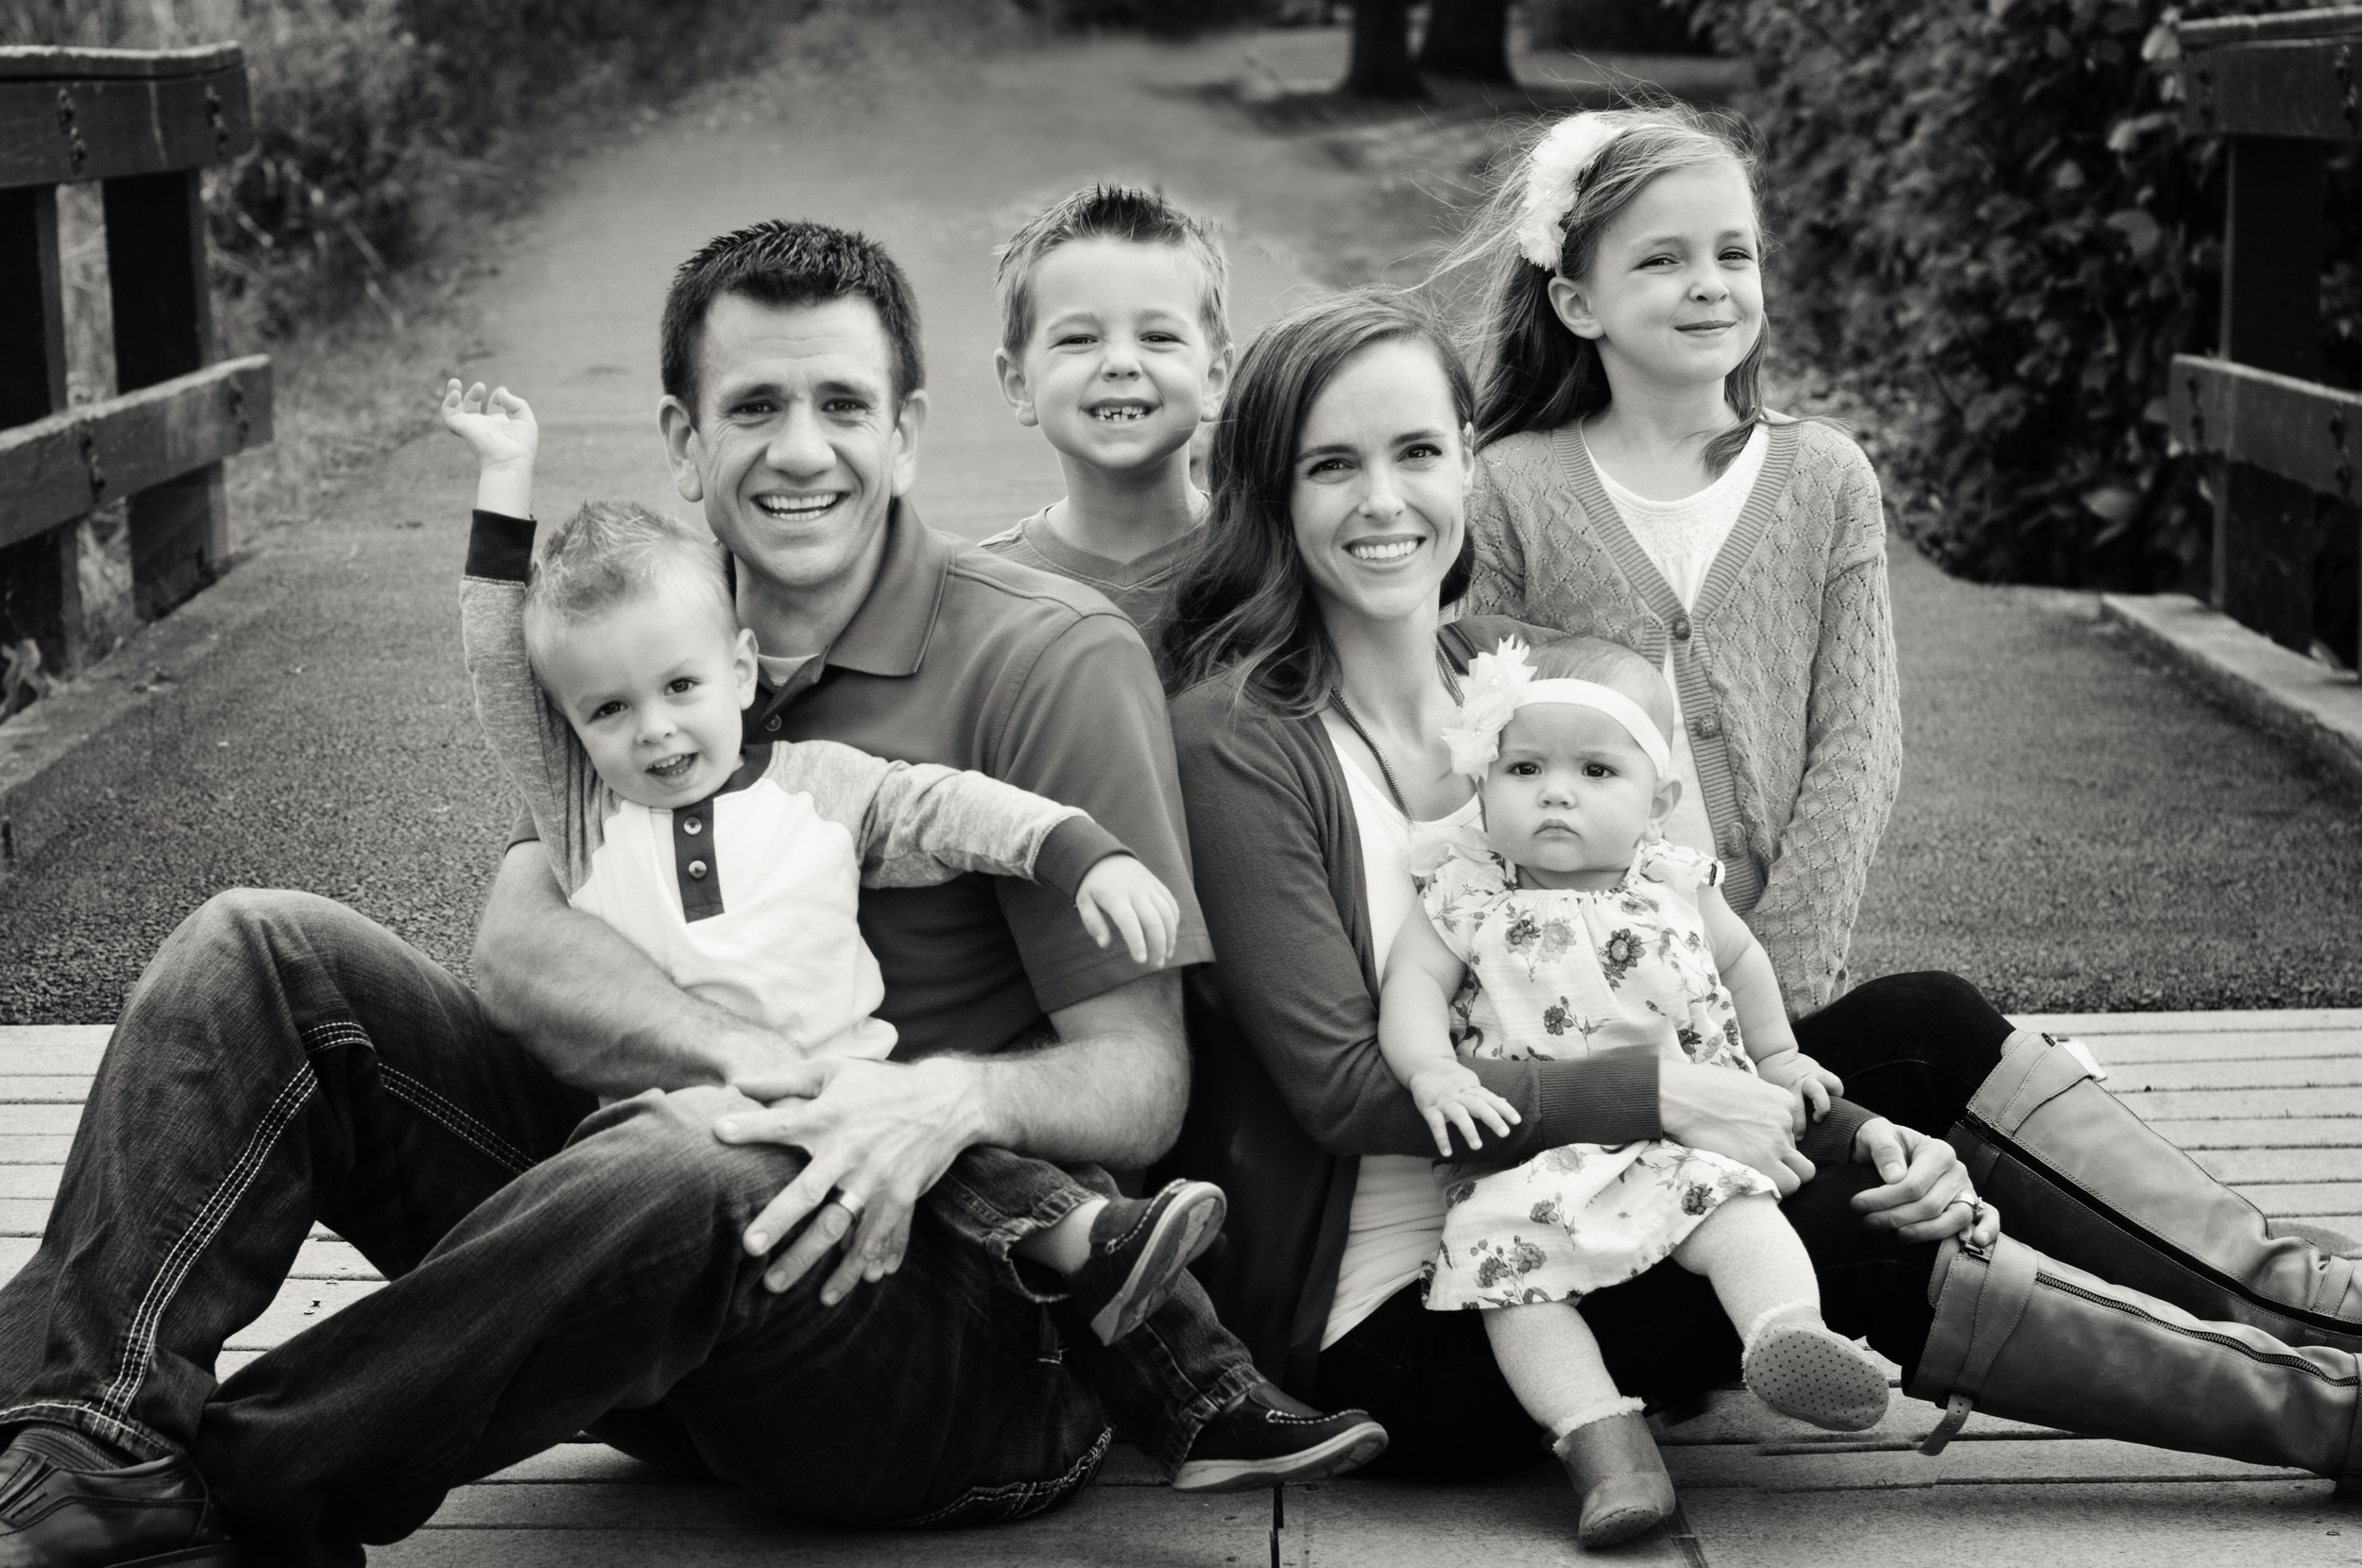 McBride Family-sitting on the bridge platinum.jpg